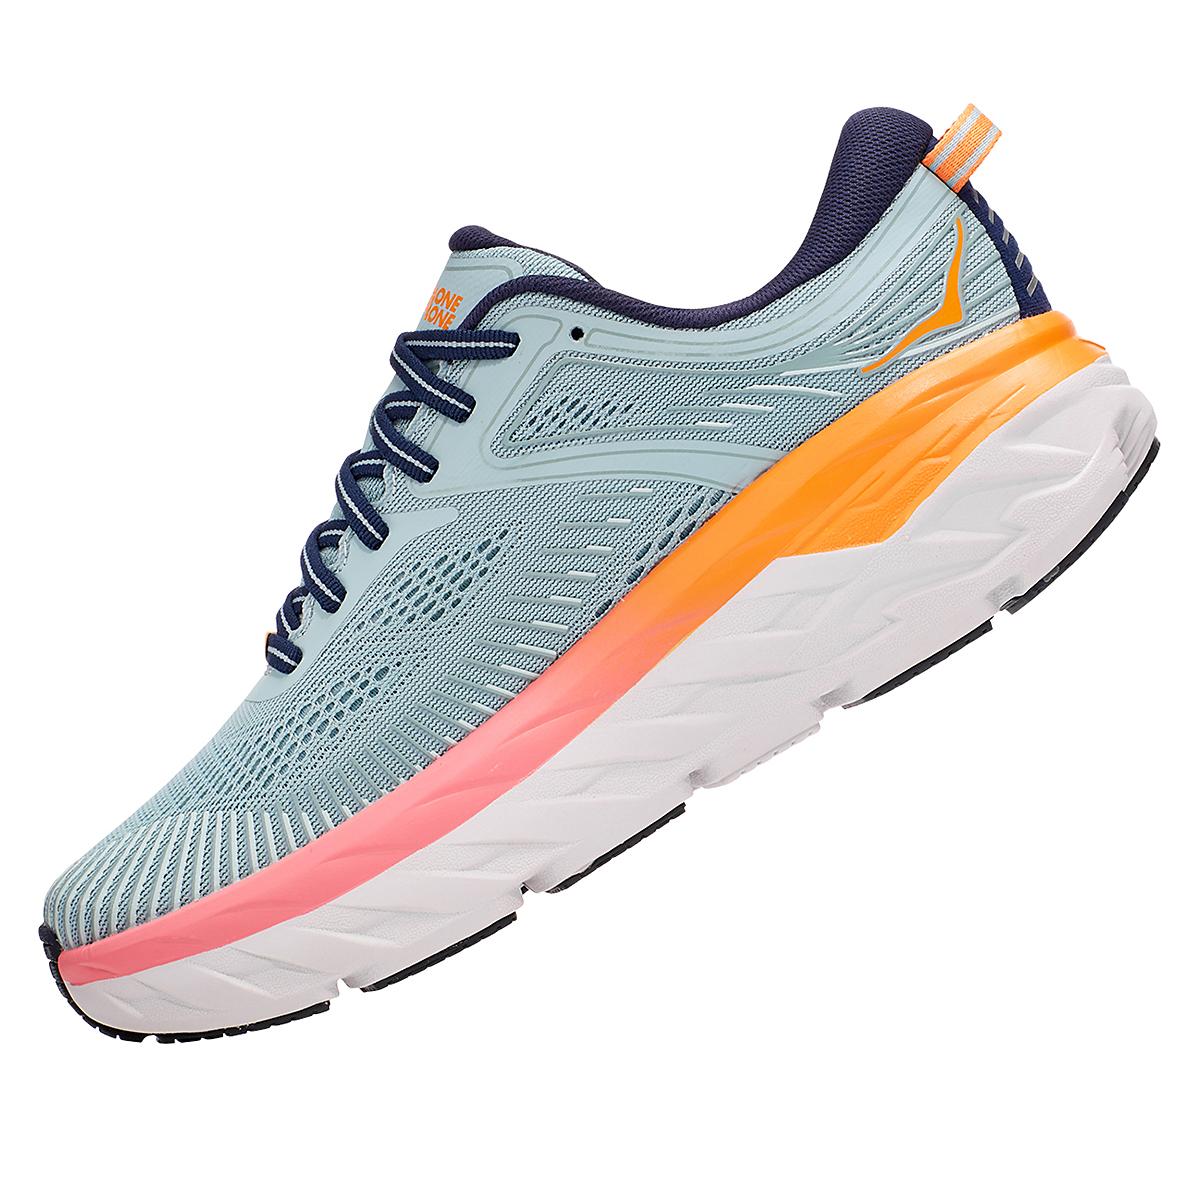 Women's Hoka One One Bondi 7 Running Shoe - Color: Blue Haze/Black Iris - Size: 5.5 - Width: Regular, Blue Haze/Black Iris, large, image 6